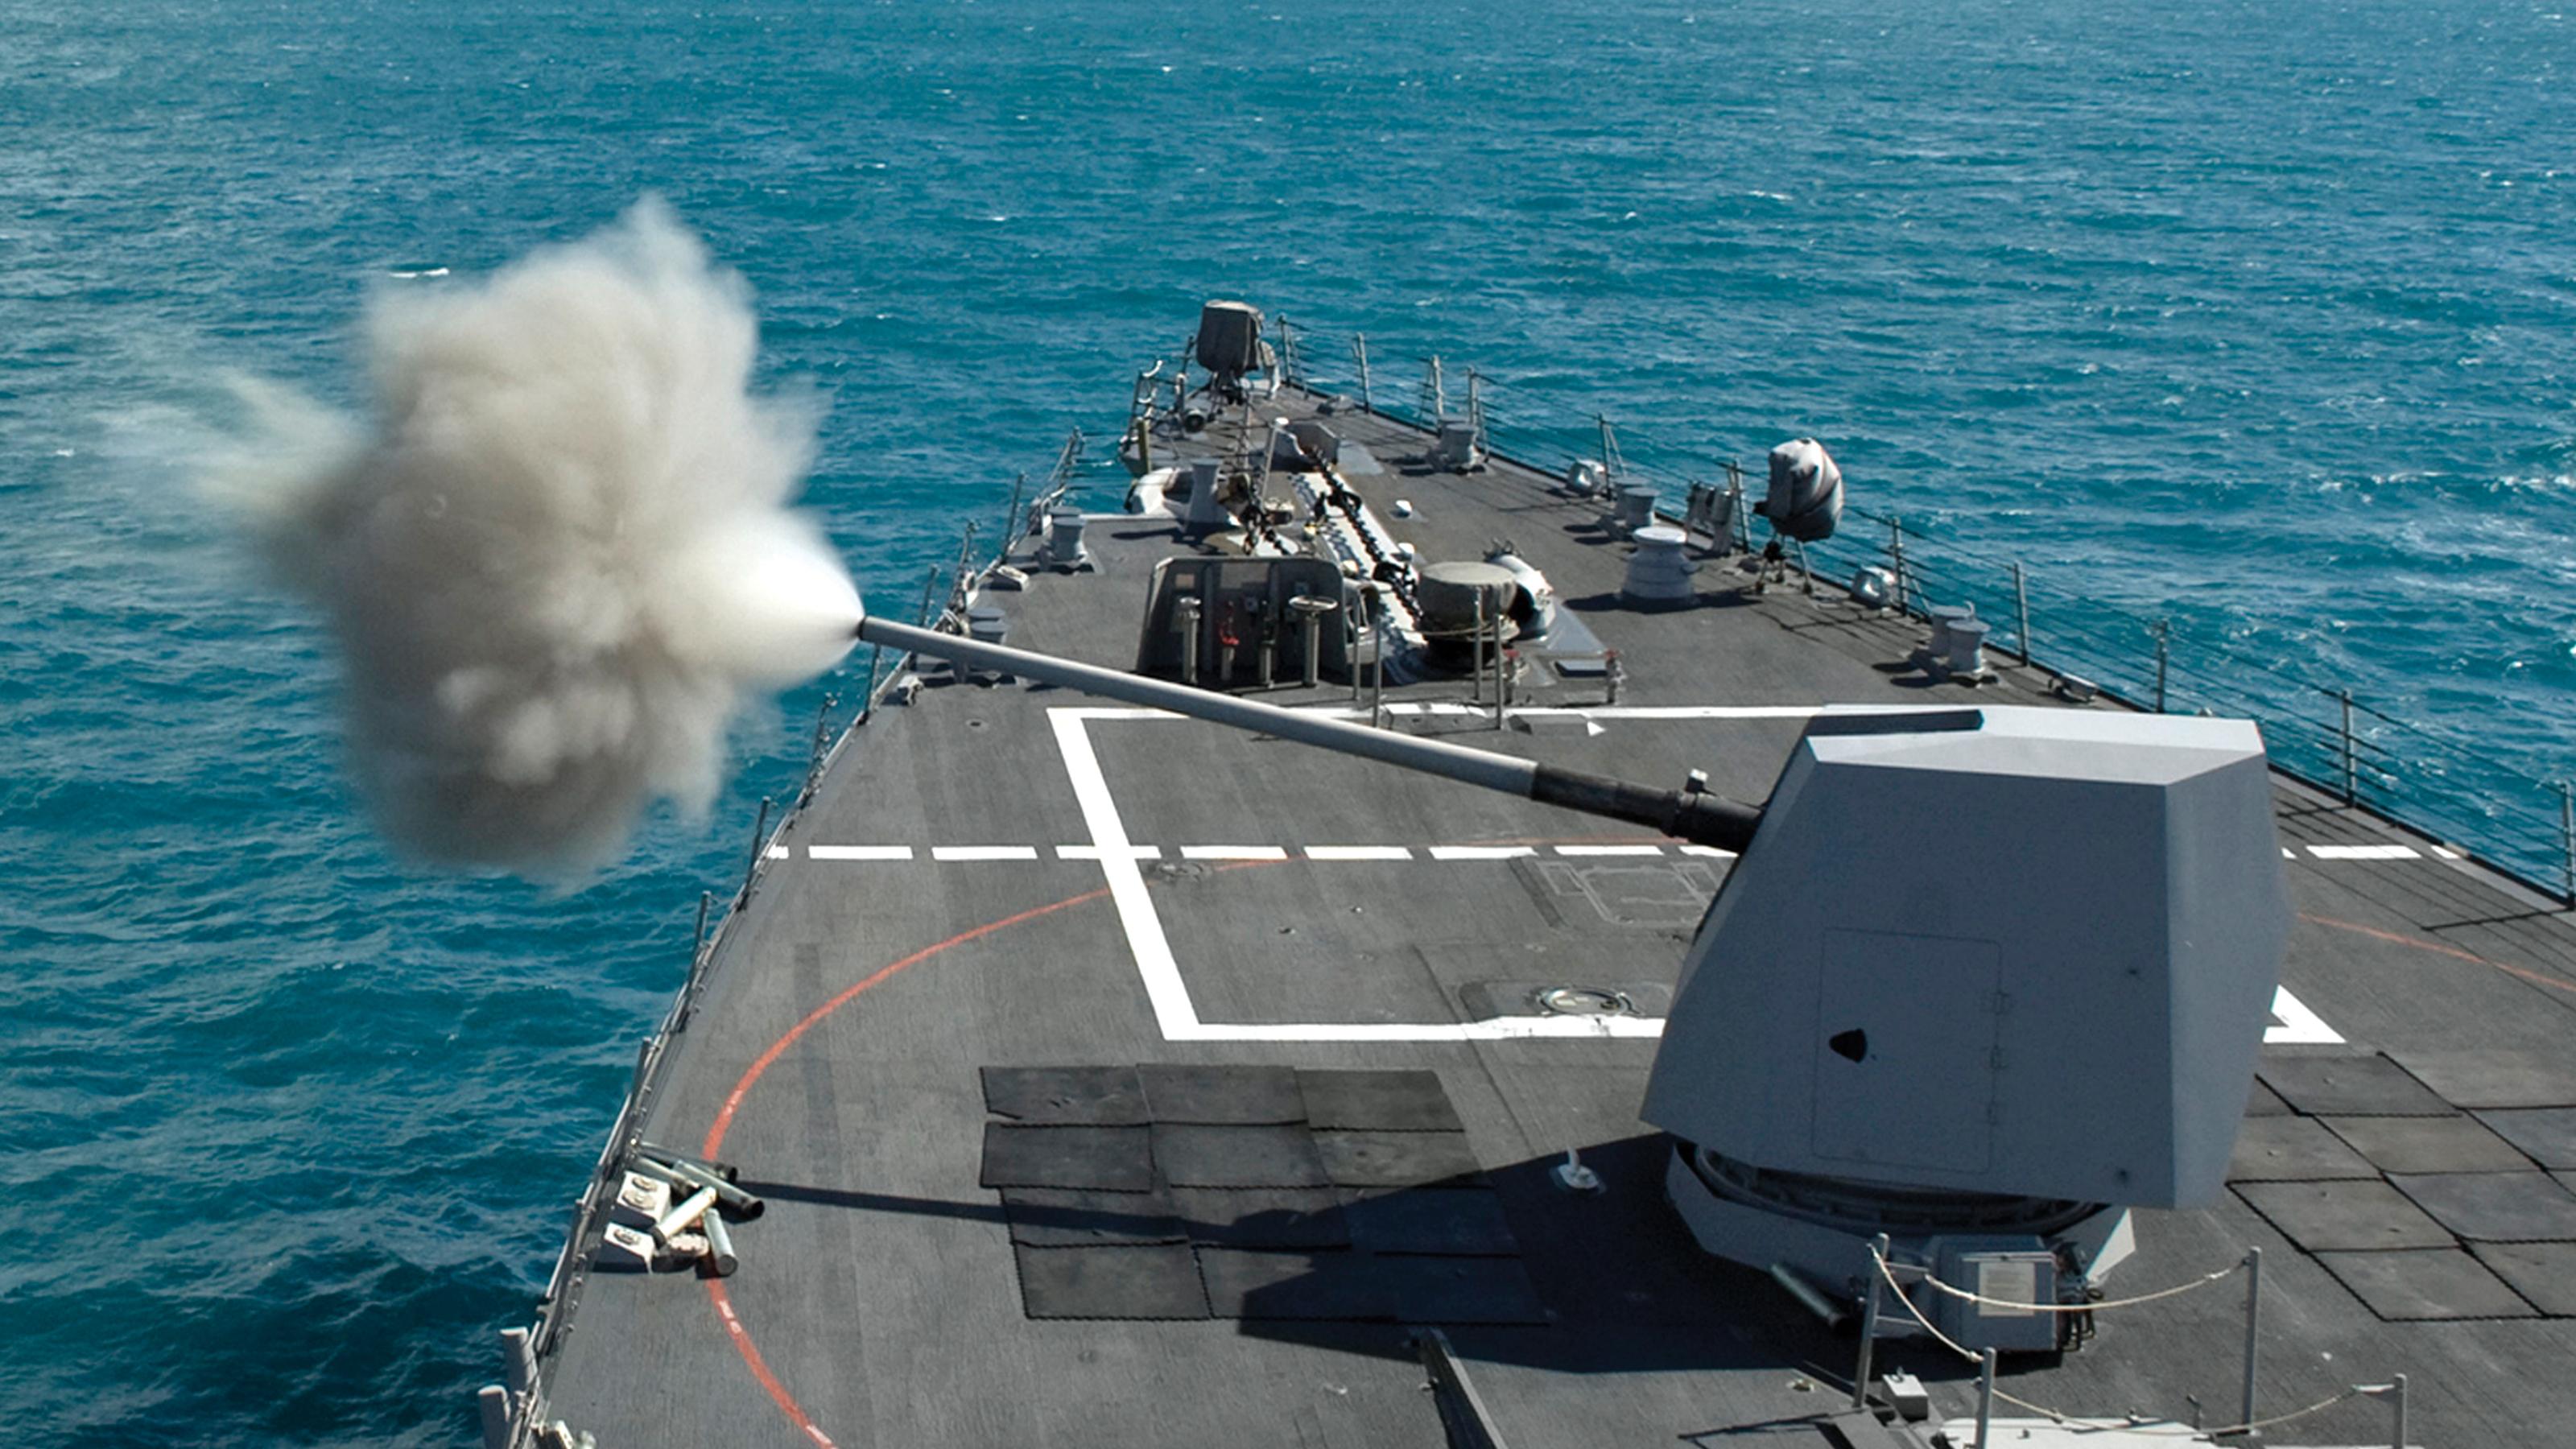 BAE Systems to Modernize Mk 45 Naval Guns under $50 Million Award ...